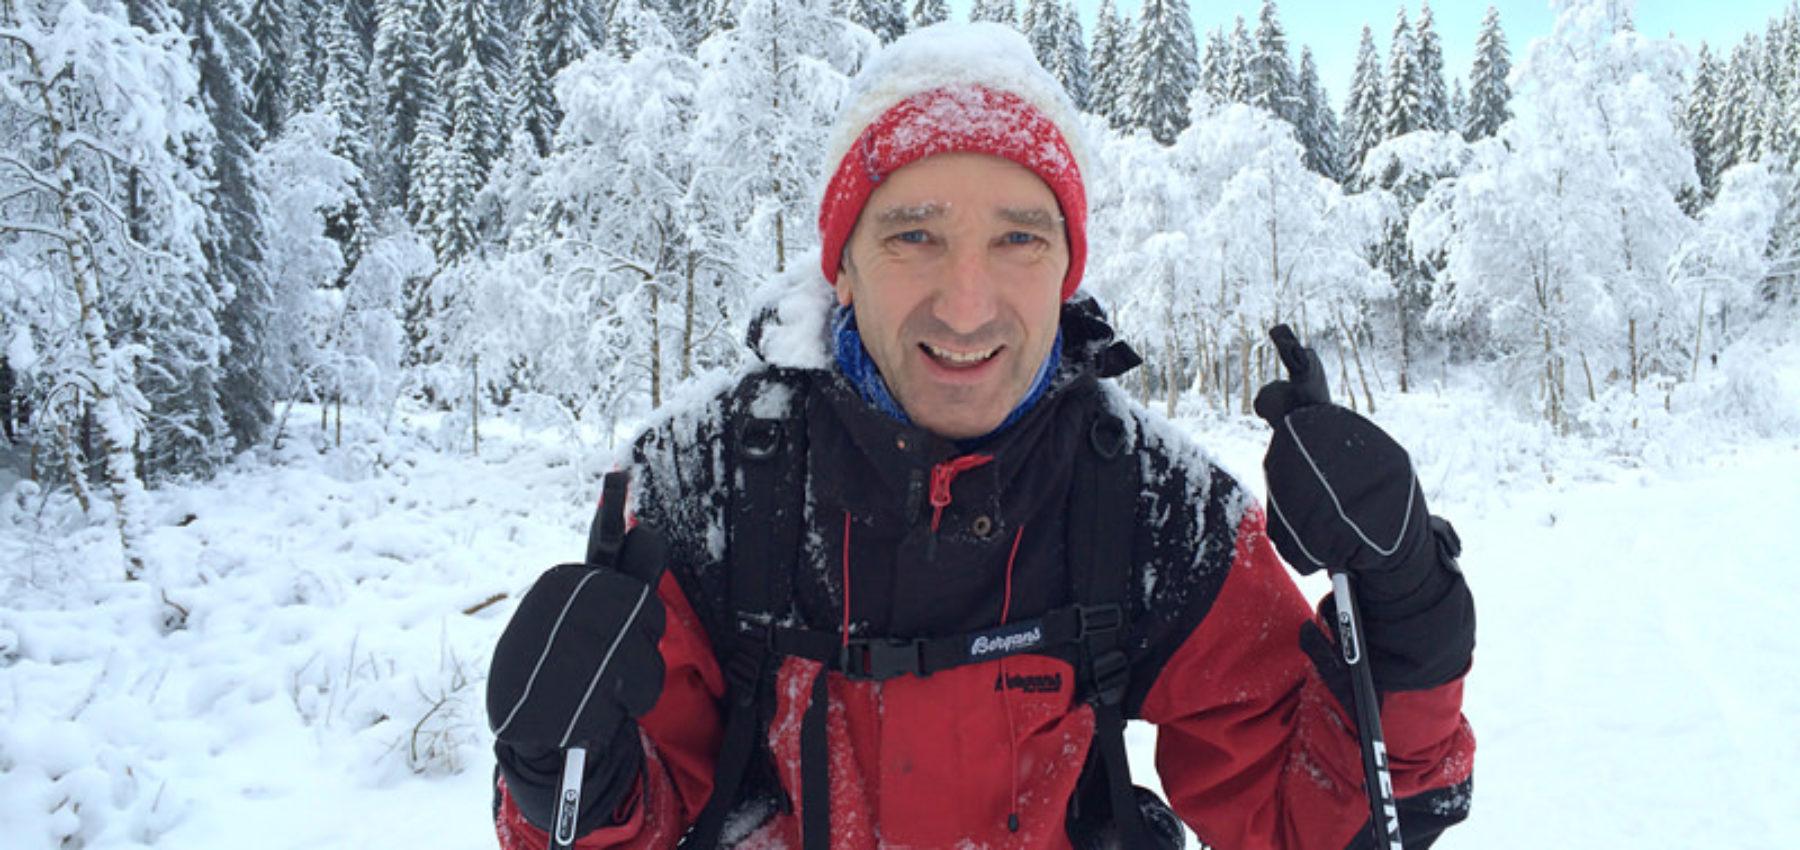 Lasse Heimdal